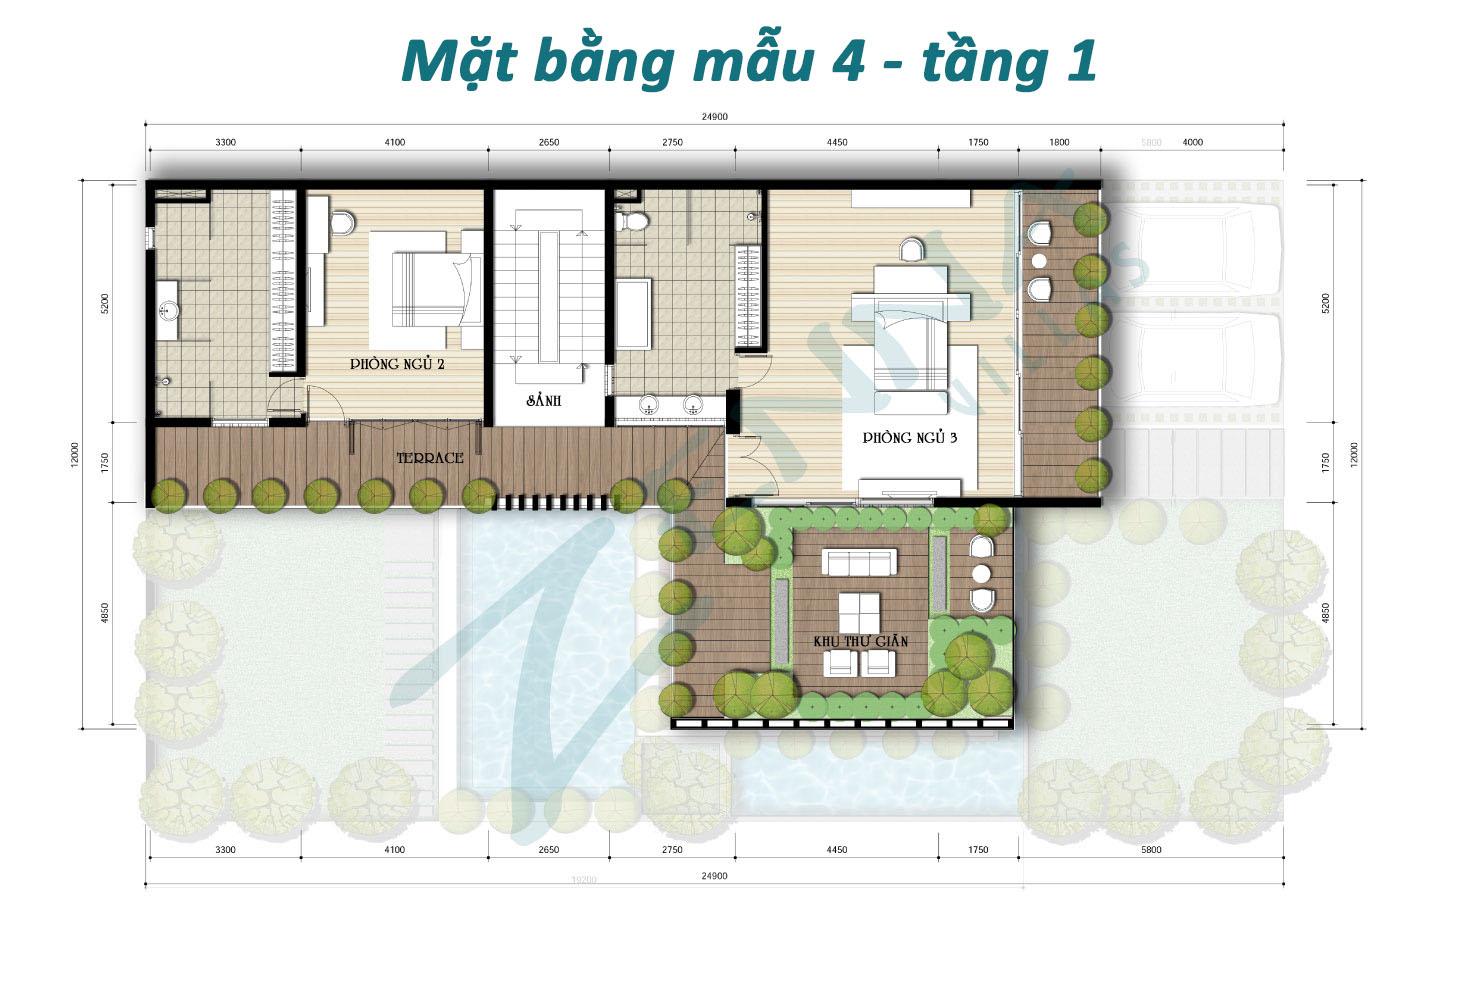 Mặt bằng tầng 1 mẫu 4 biệt thự Zenna Villas